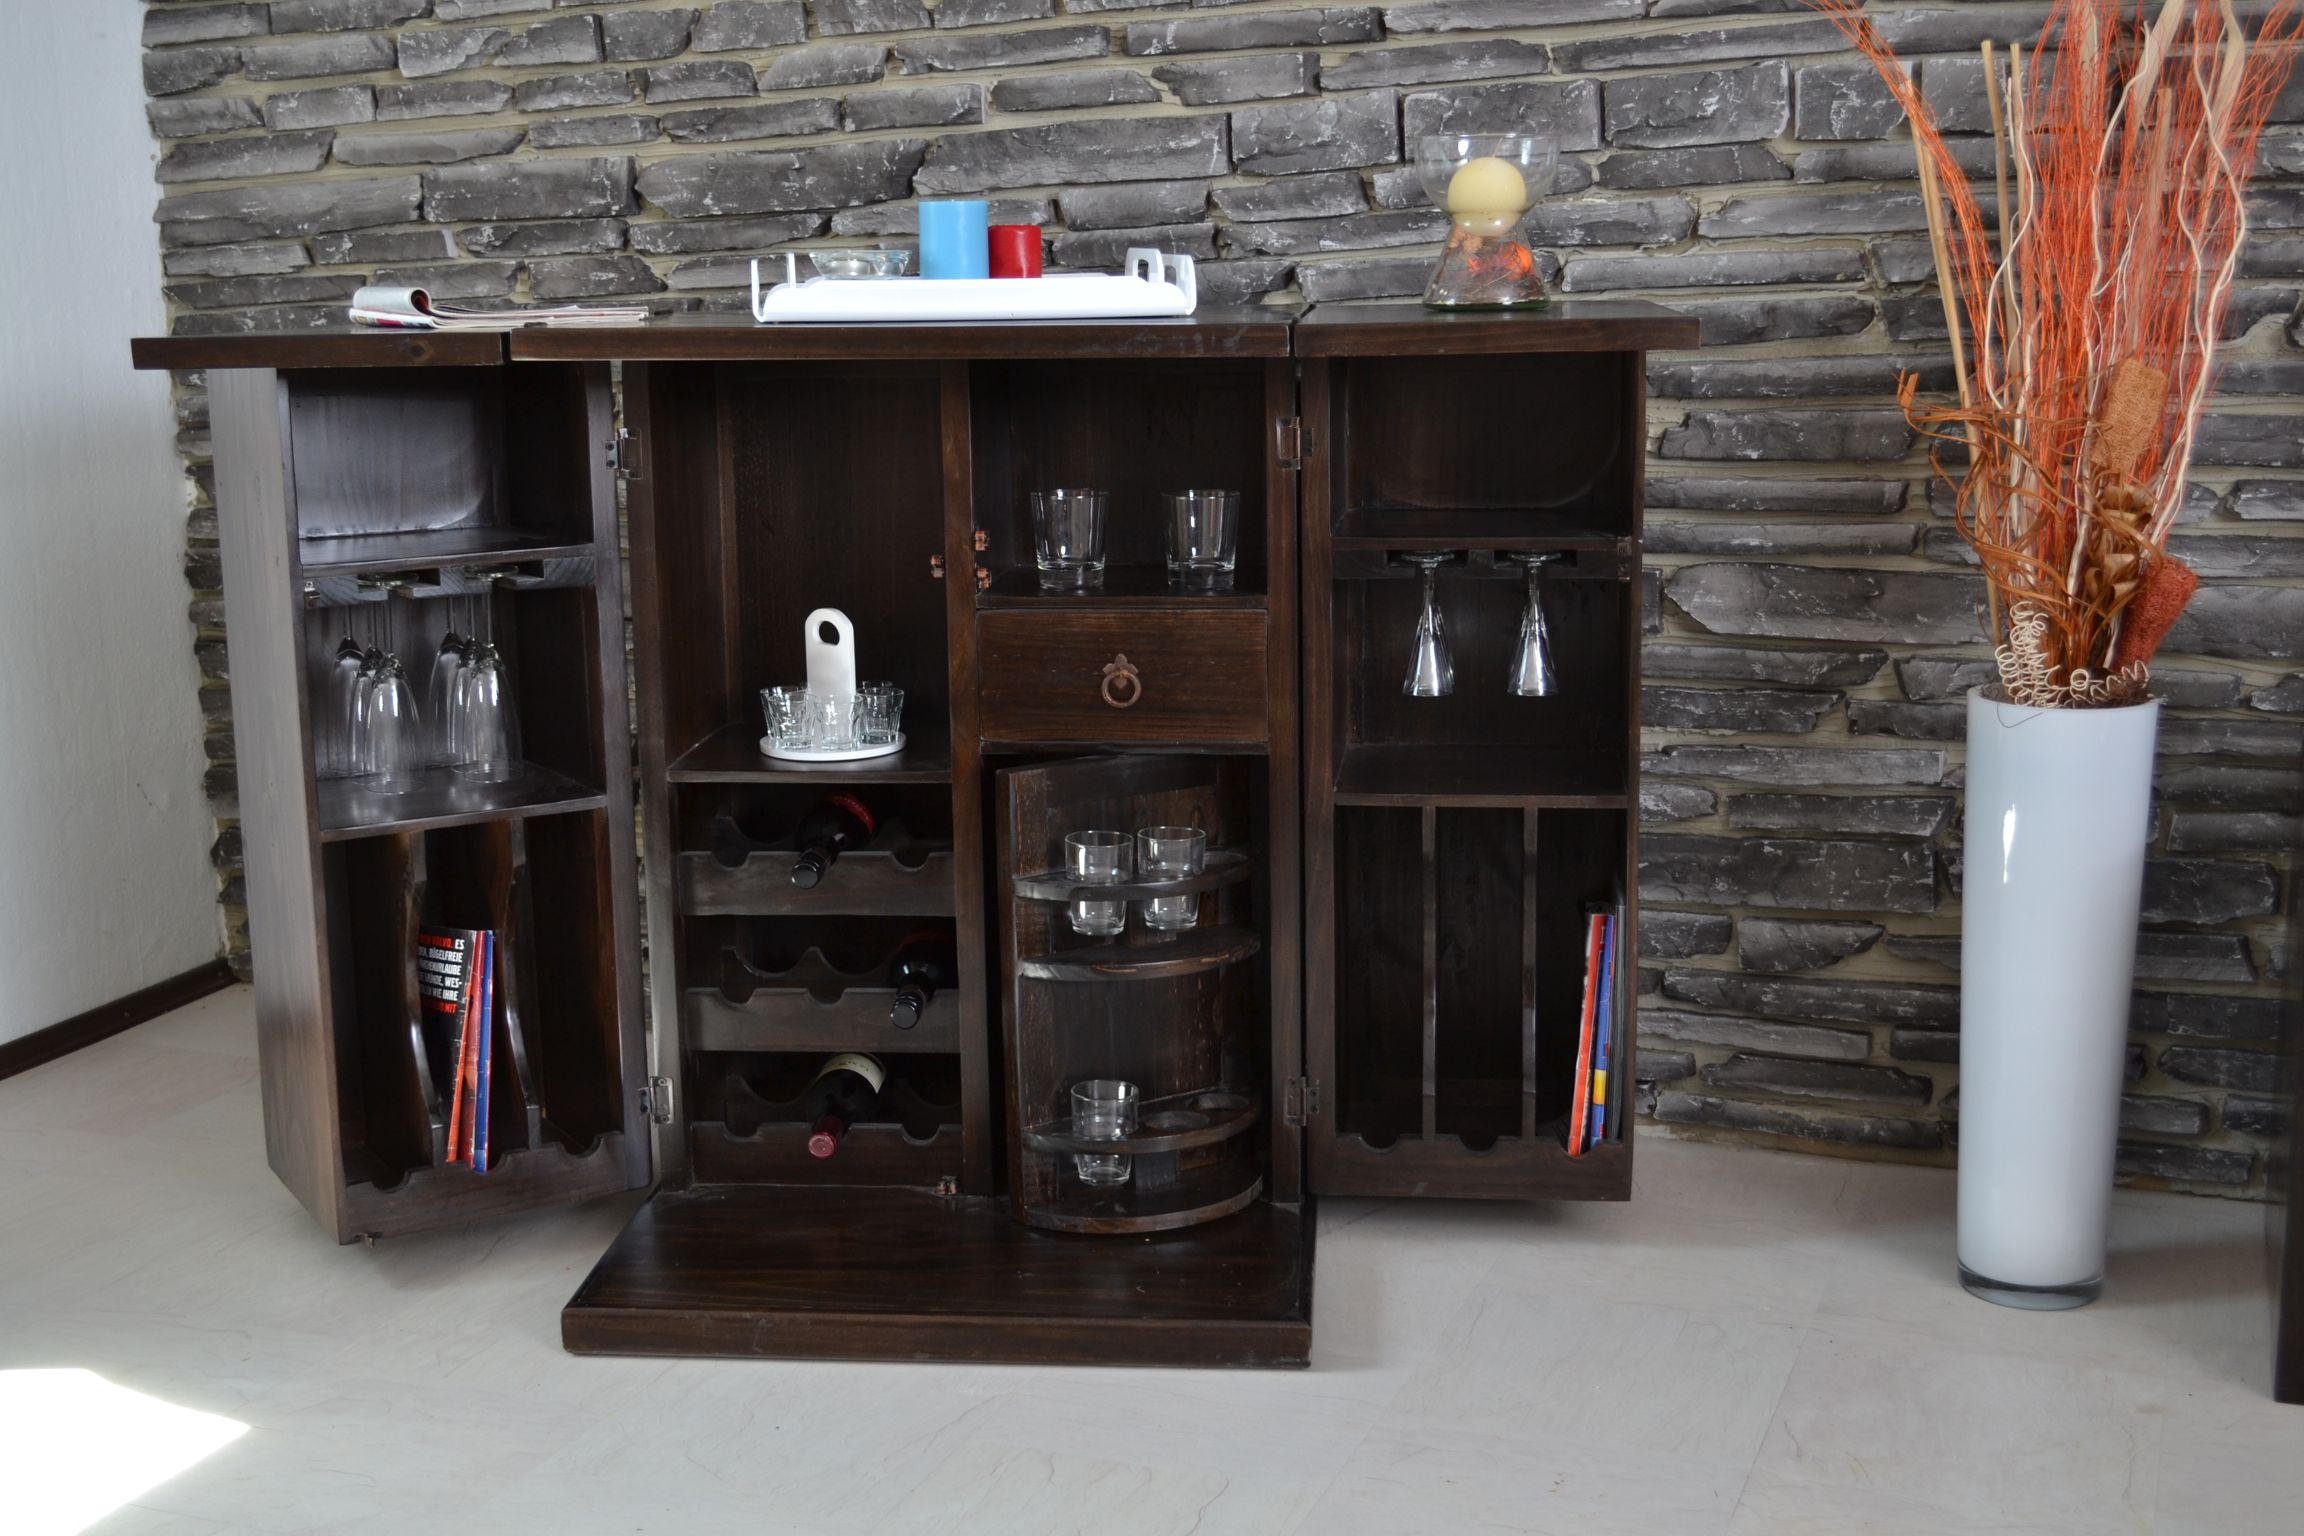 m bel kolonialstil mexico neuesten design kollektionen f r die familien. Black Bedroom Furniture Sets. Home Design Ideas